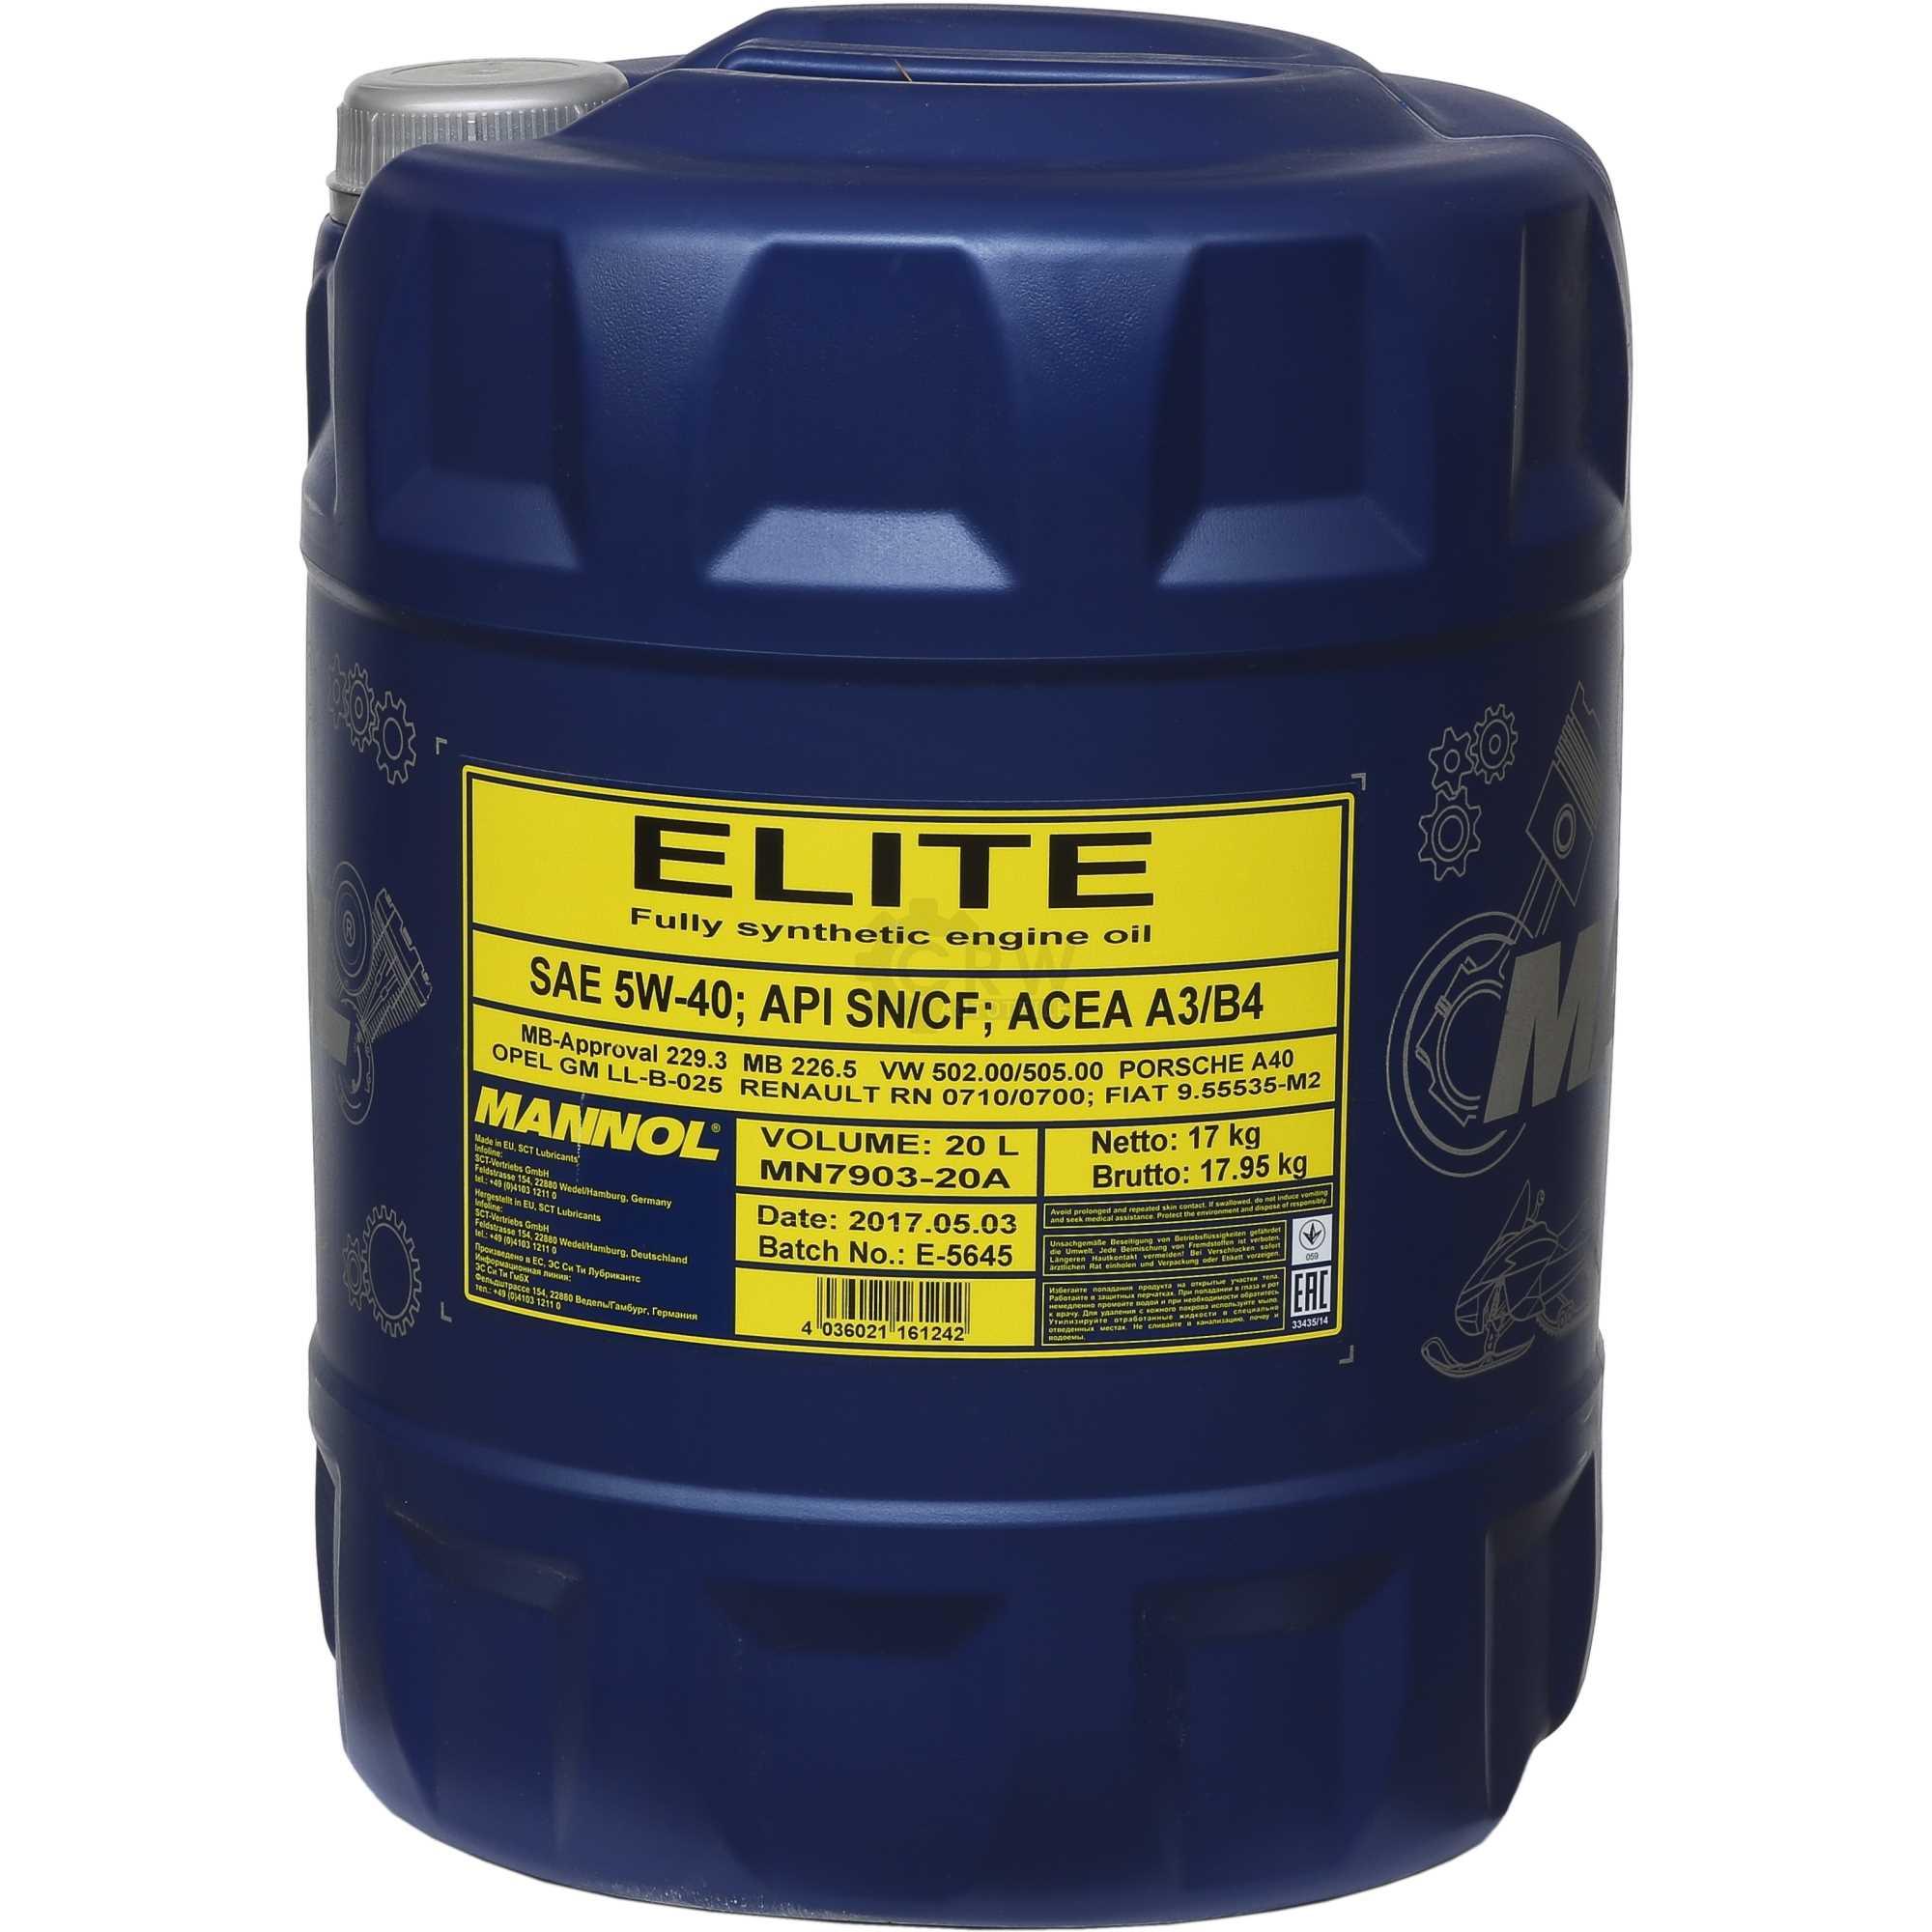 Aceite-del-motor-aceite-5w40-10w40-15w40-5w30-10w60-1l-4l-5l-7l-10l-20l miniatura 27